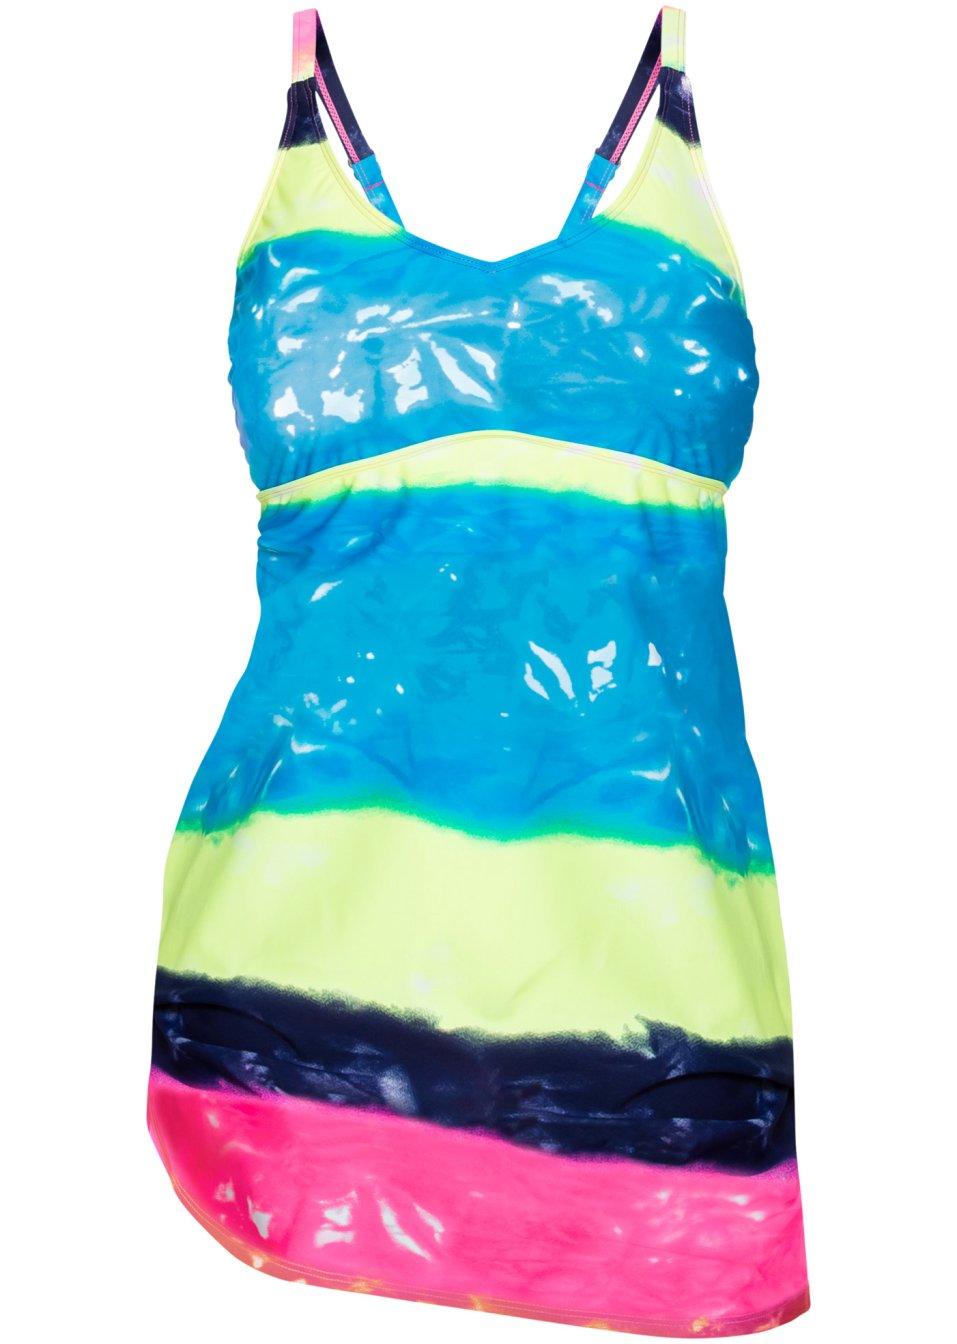 Trendy Badekleid mit integriertem Badenanzug. - batik 3j0pU 5jQdc